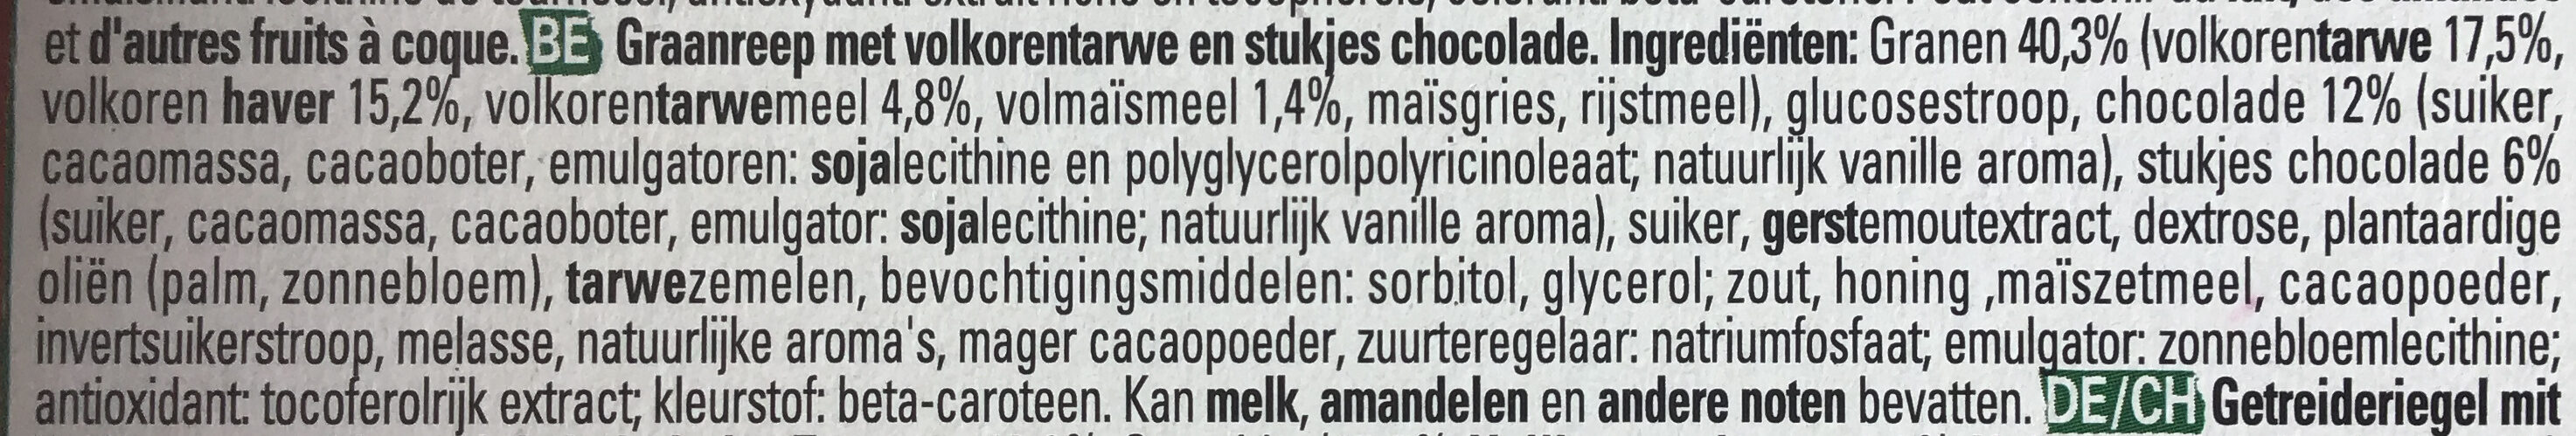 Clusters crunchy choco - Ingrediënten - nl